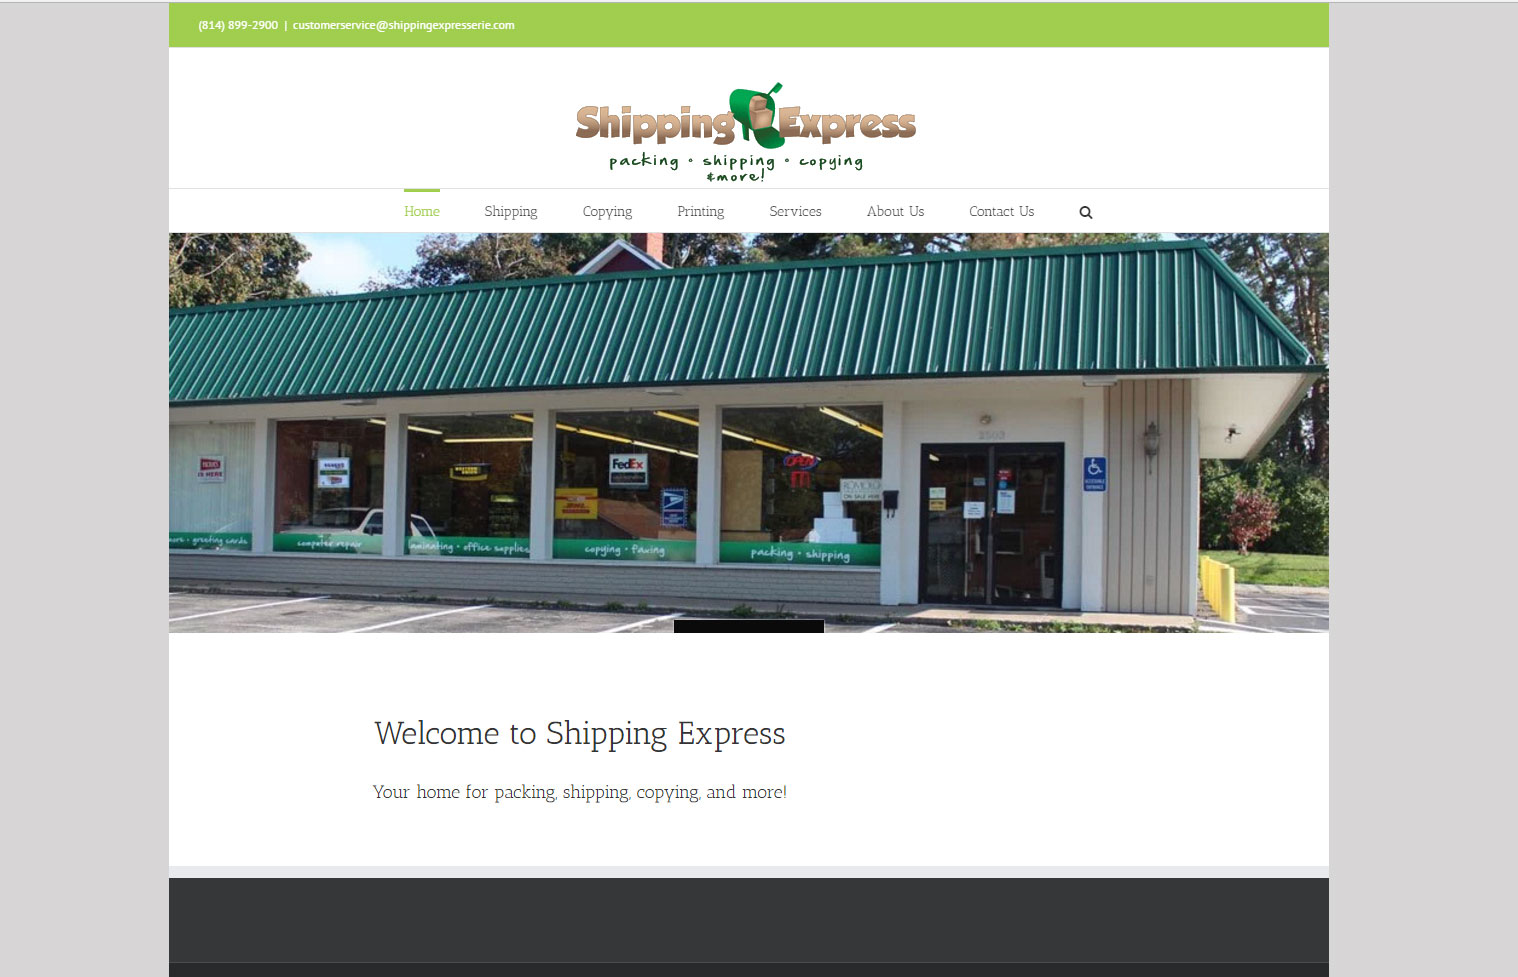 shippingexpress